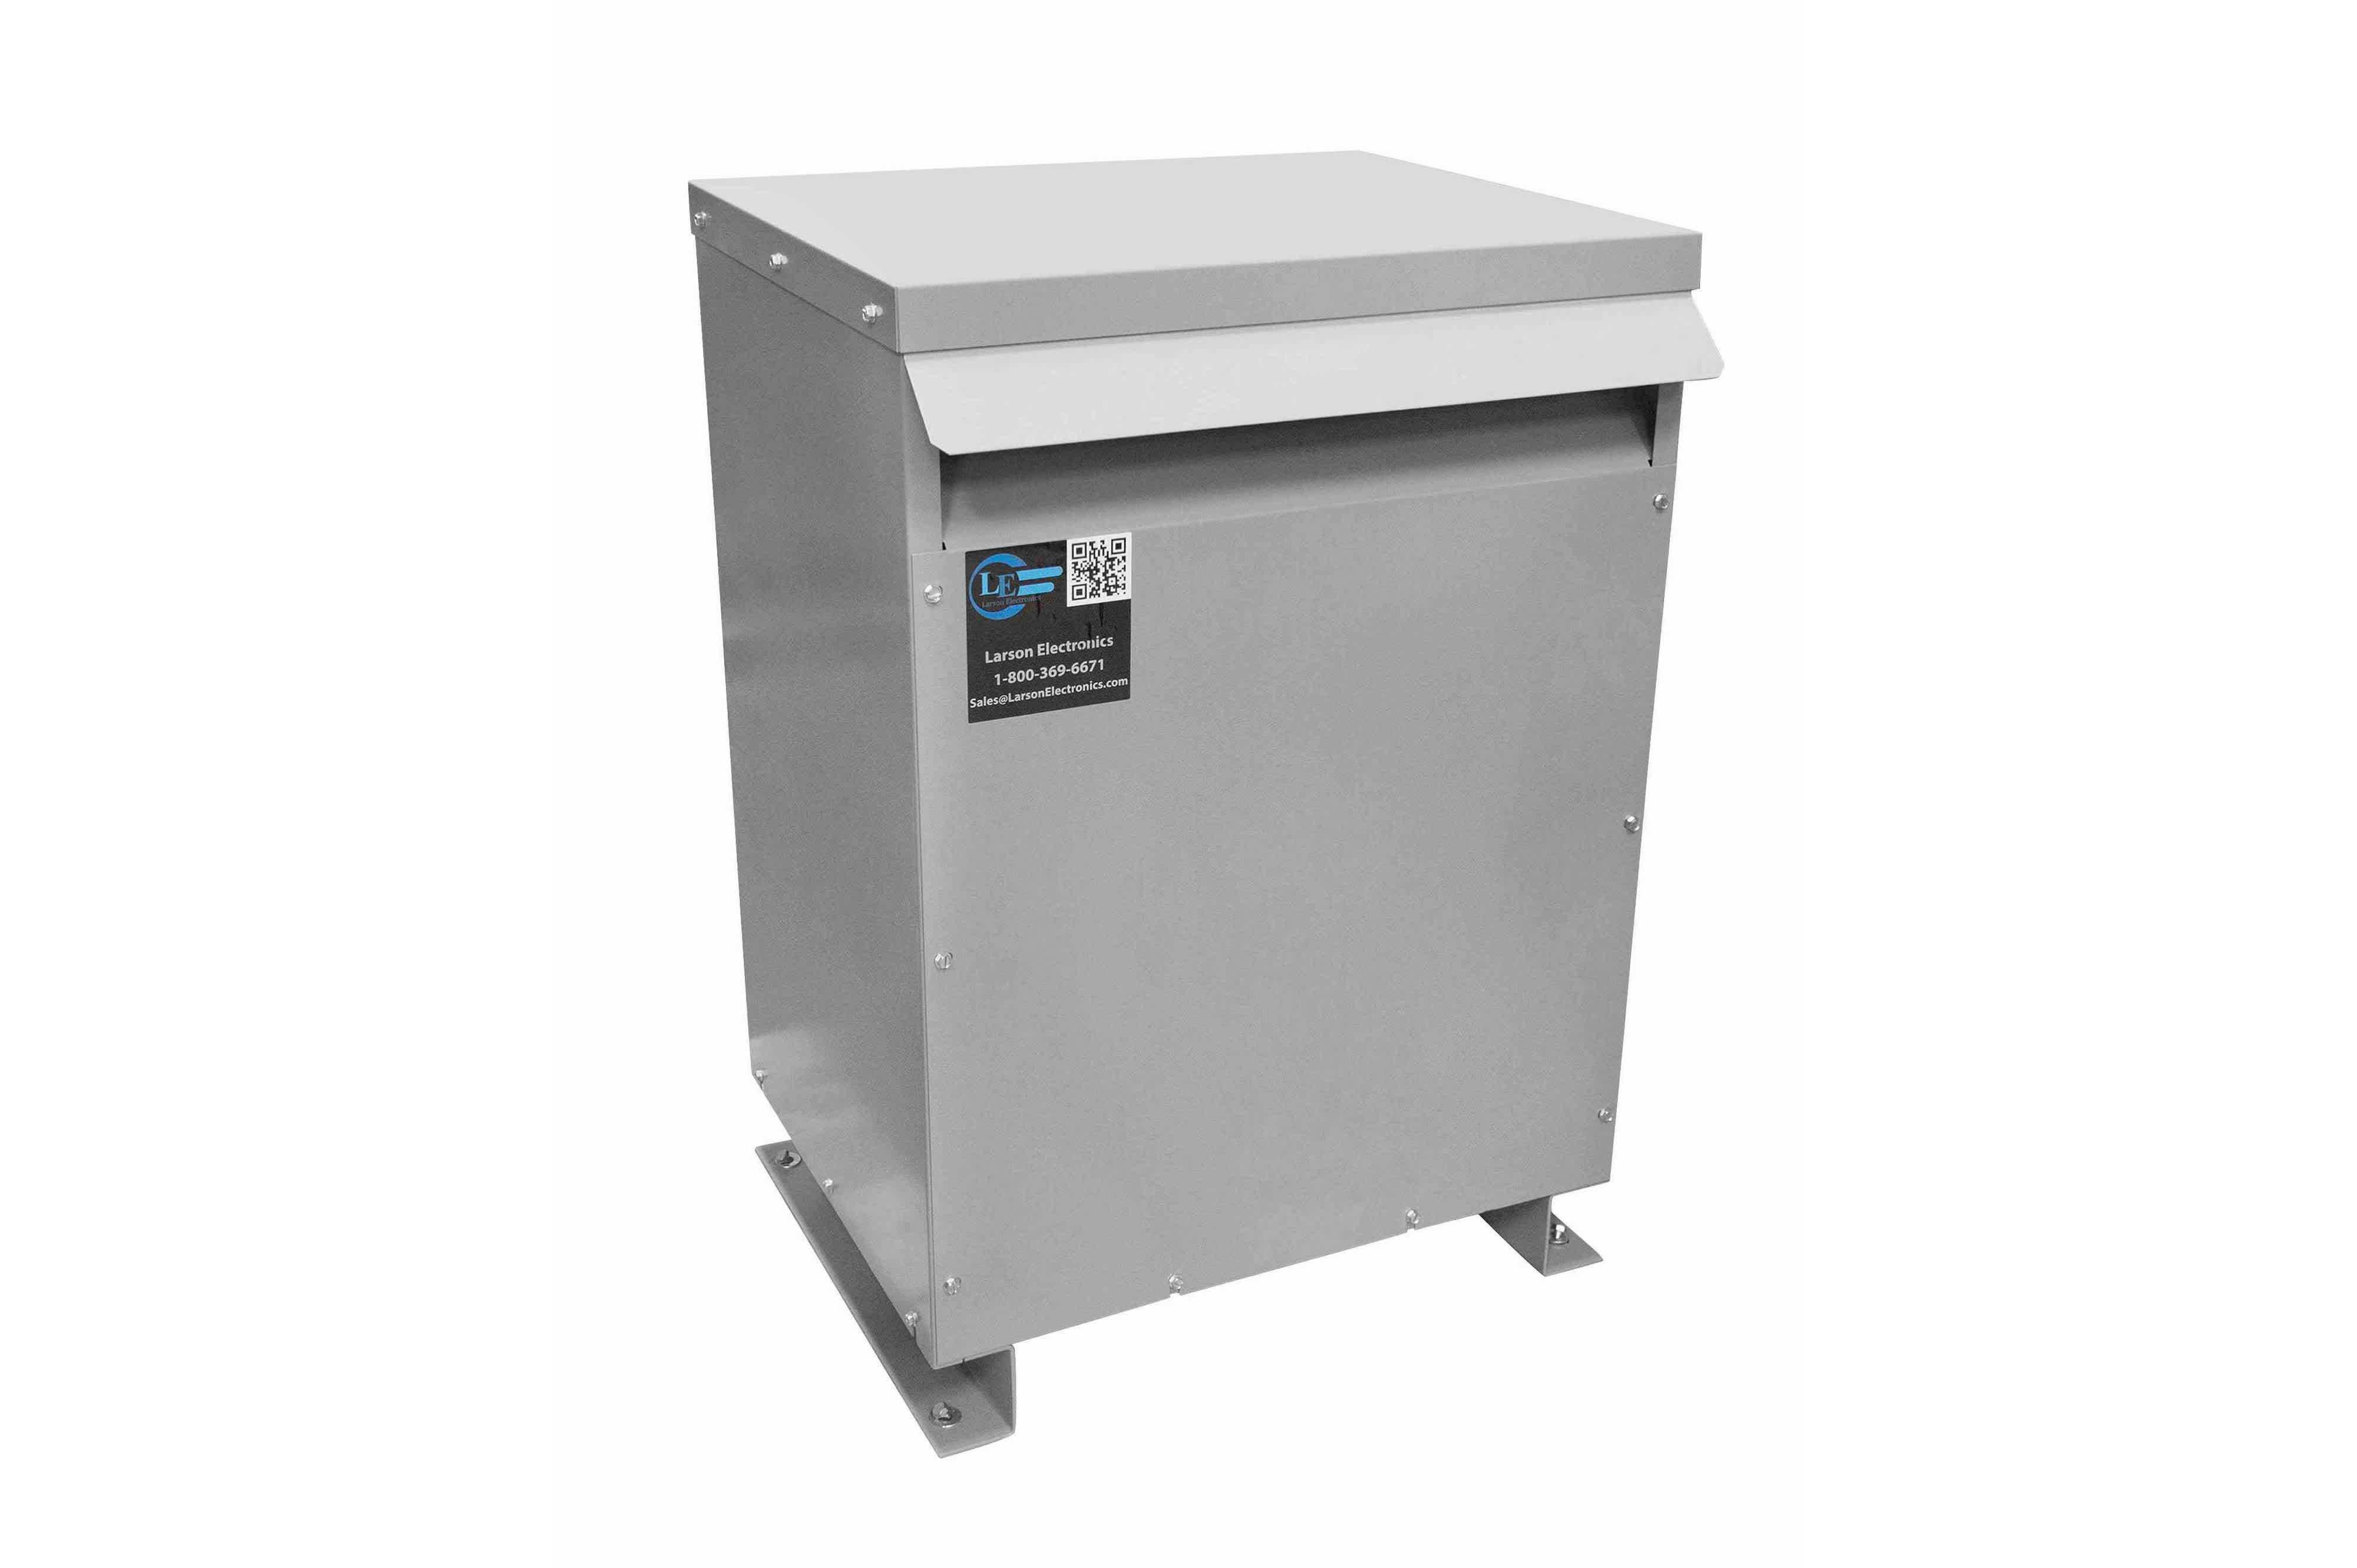 400 kVA 3PH Isolation Transformer, 415V Wye Primary, 208V Delta Secondary, N3R, Ventilated, 60 Hz